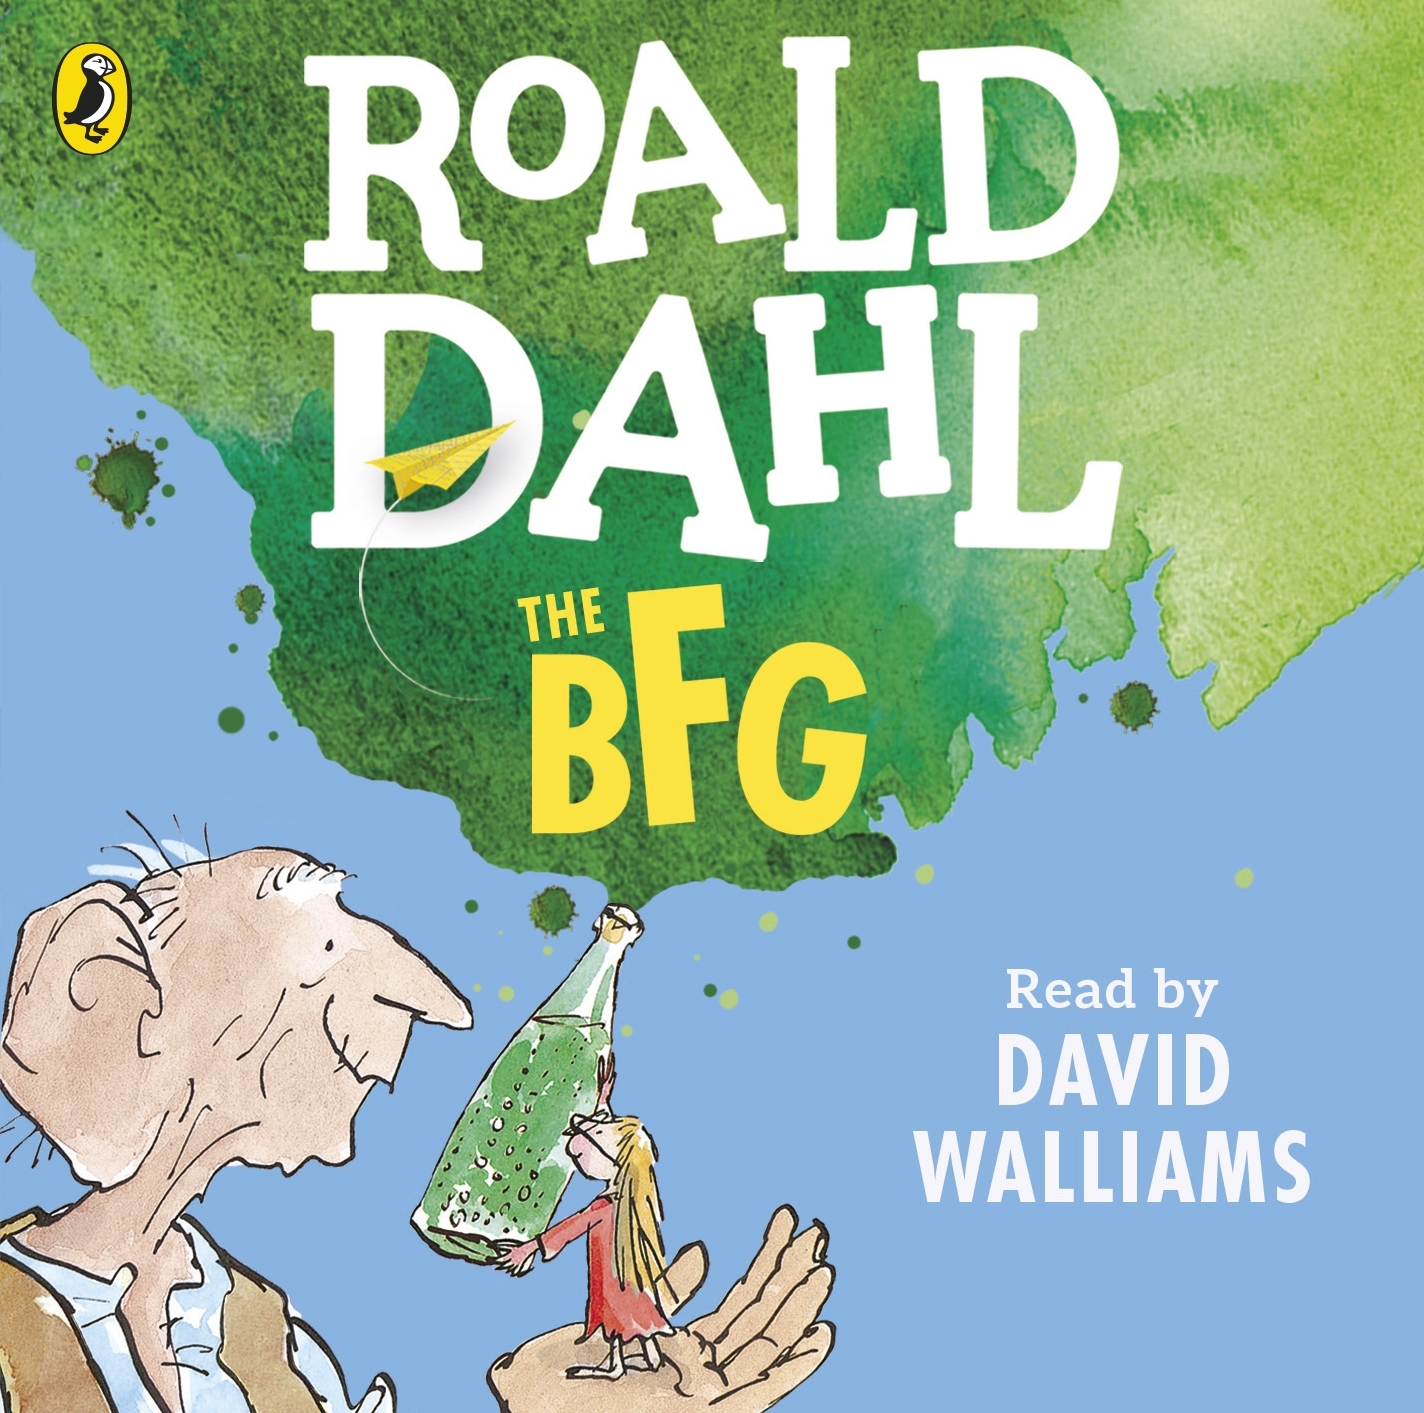 Roald Dahl Book Cover Pictures ~ The bfg by roald dahl penguin books australia